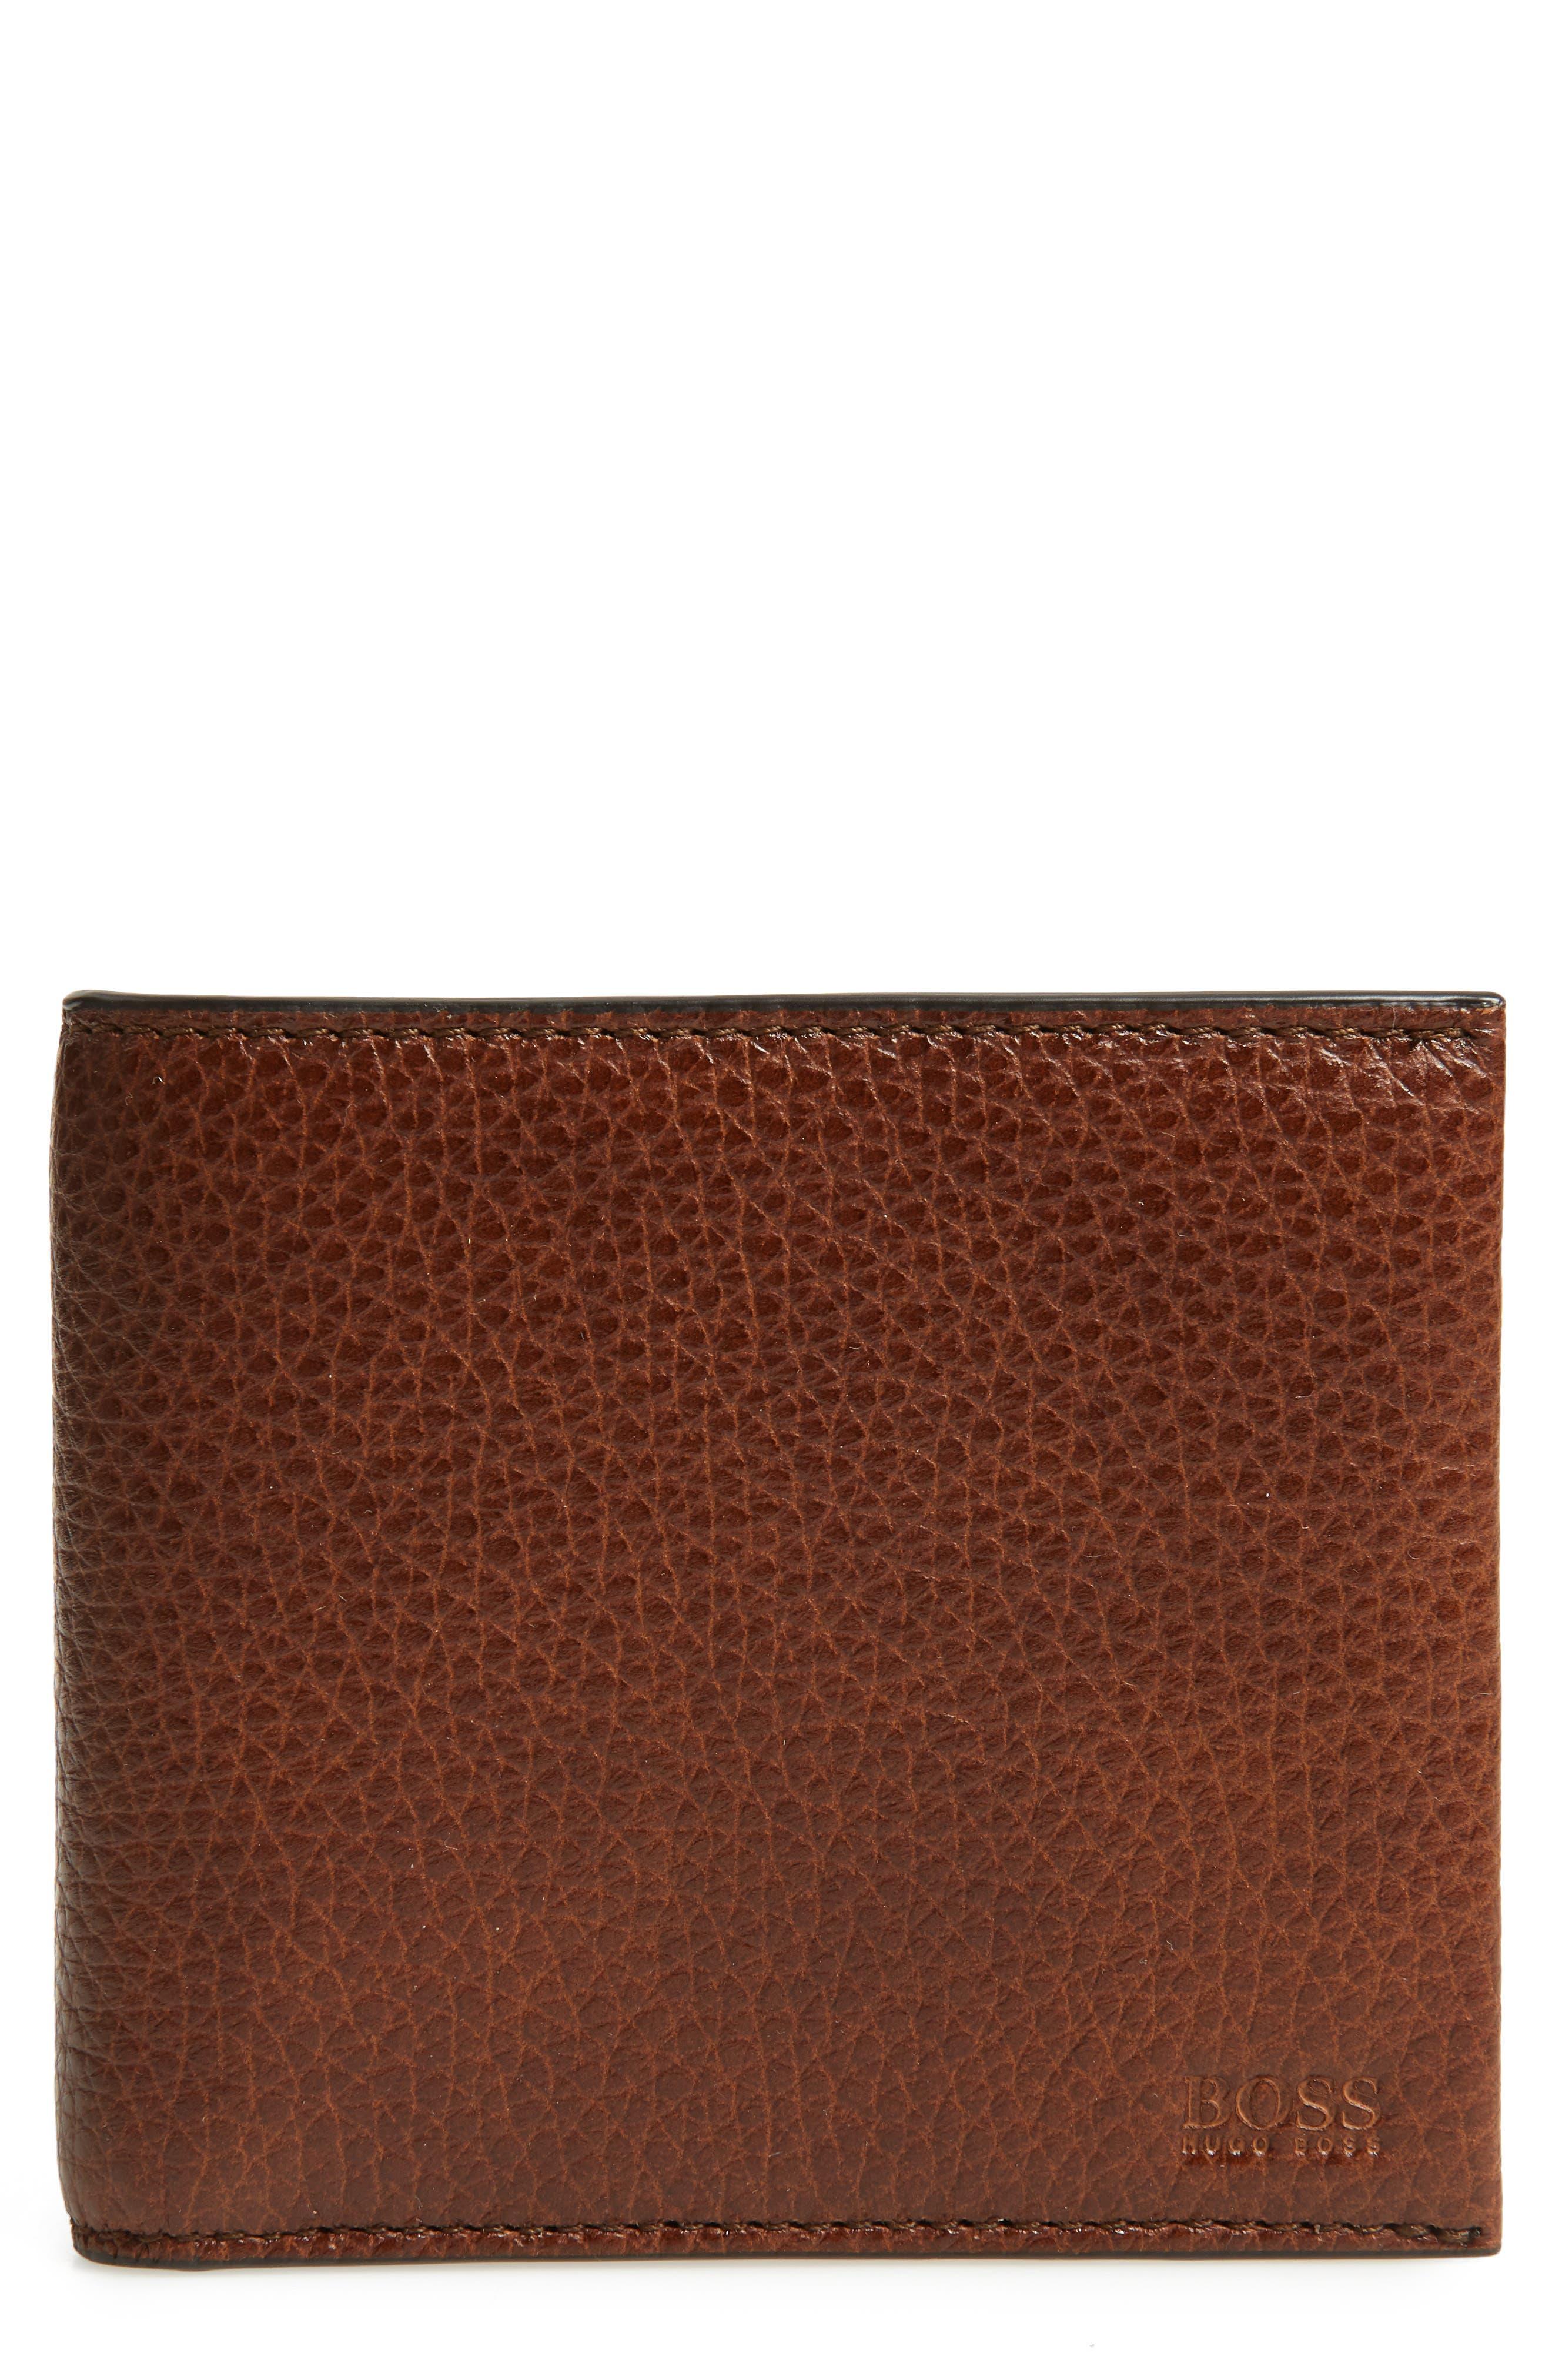 Traveller Leather Wallet,                         Main,                         color, MEDIUM BROWN